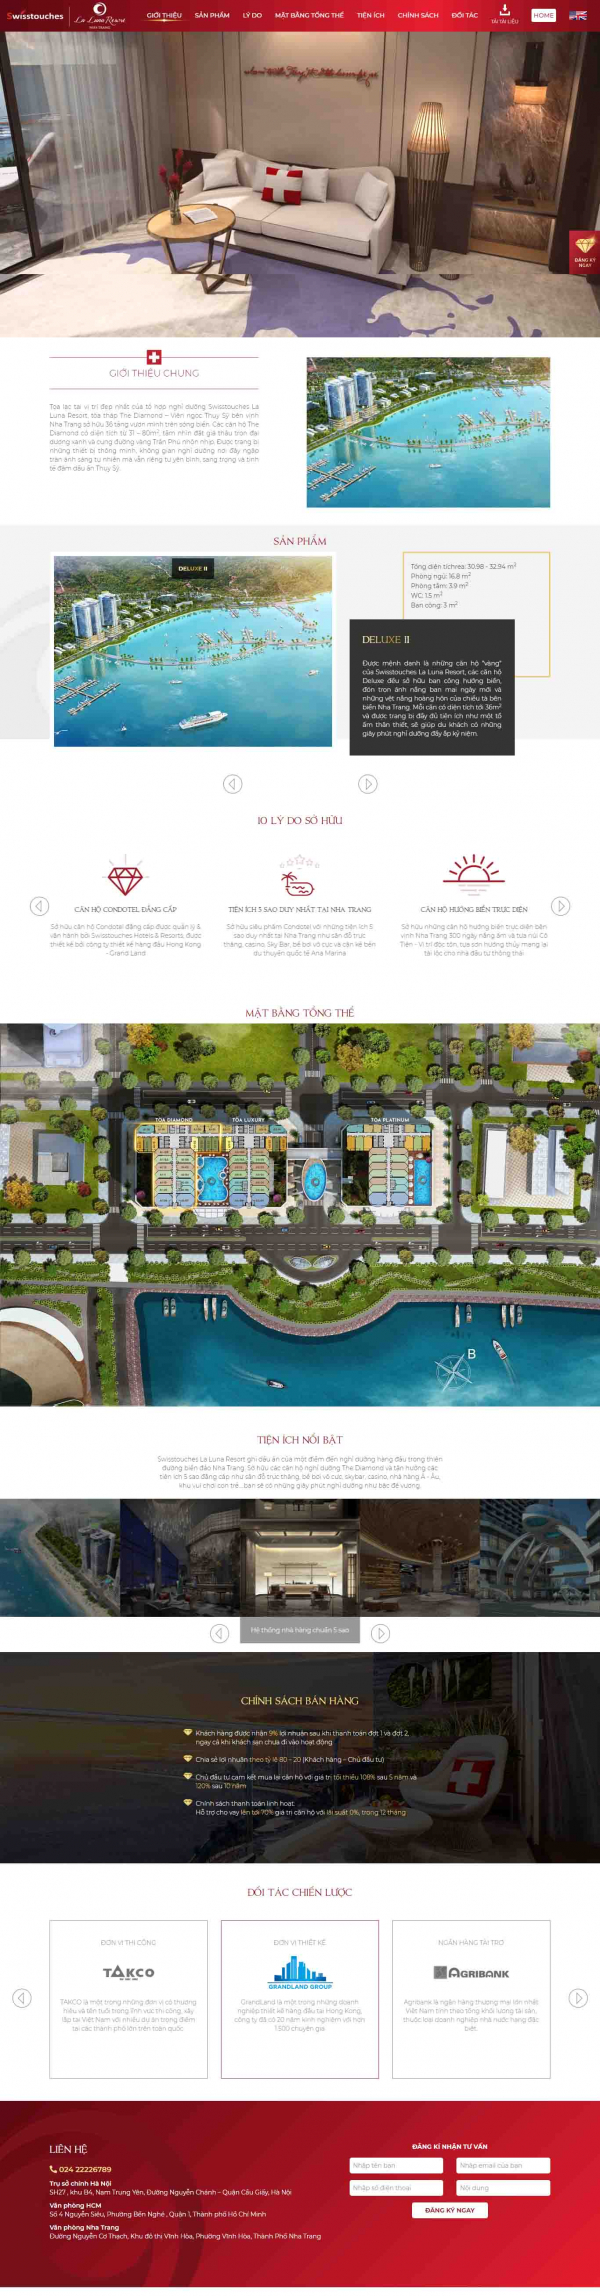 Mẫu giao diện thiết kế web landing page bat dong san chuyen nghiep